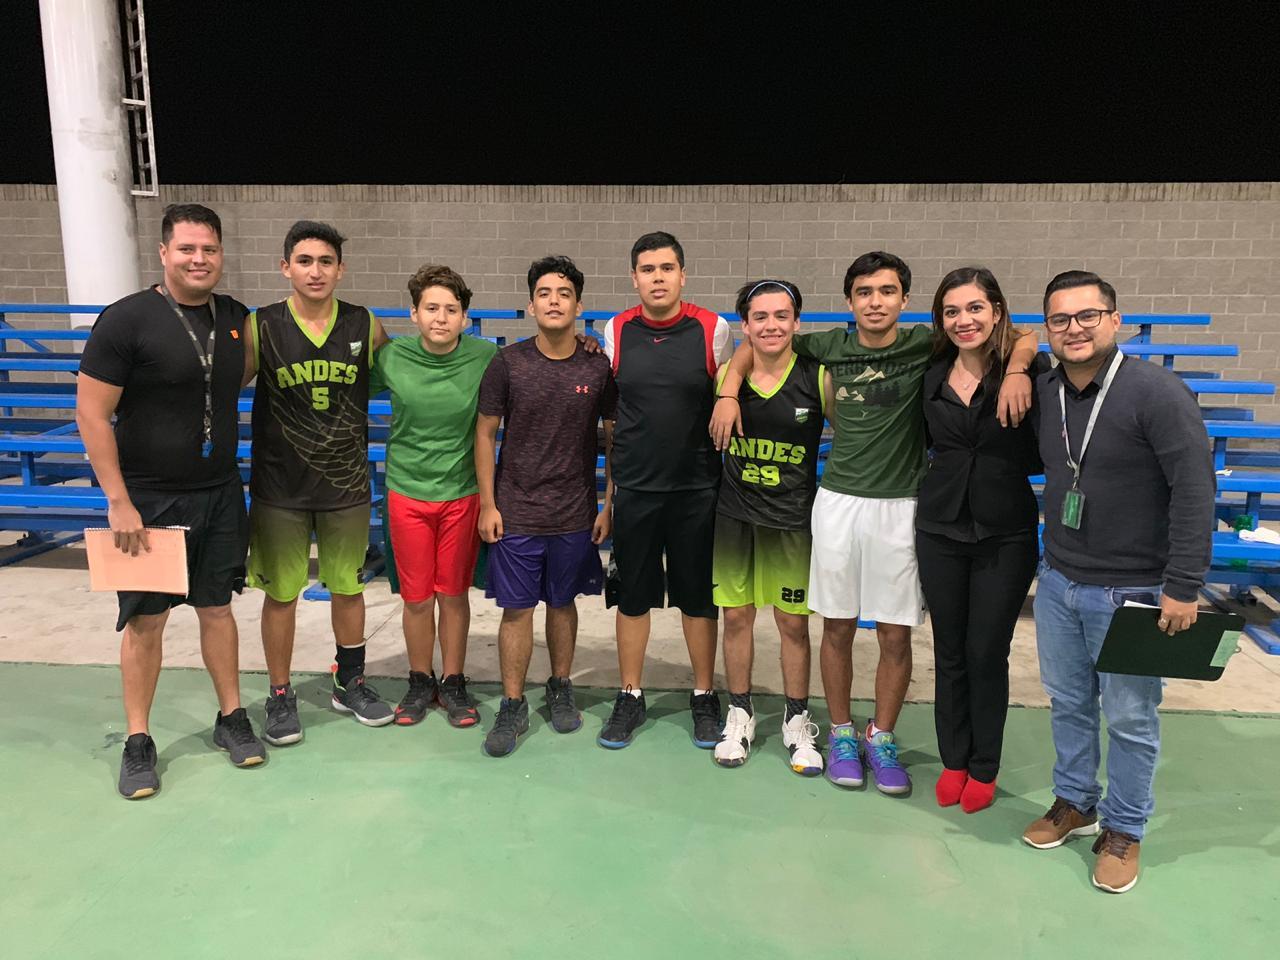 Eligen a seis jugadores del primer Try Out de Baloncesto TecMilenio-Imdem